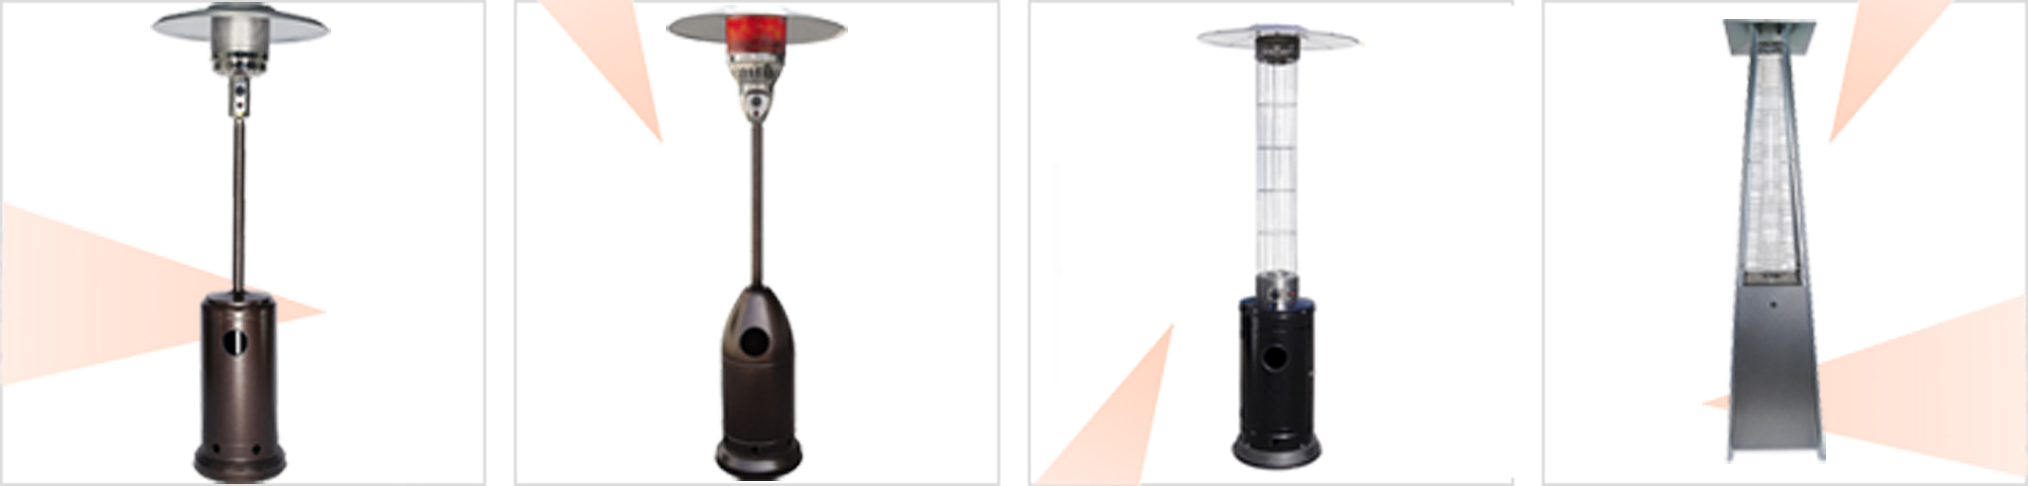 Garden Outdoor Patio Gas Heaters